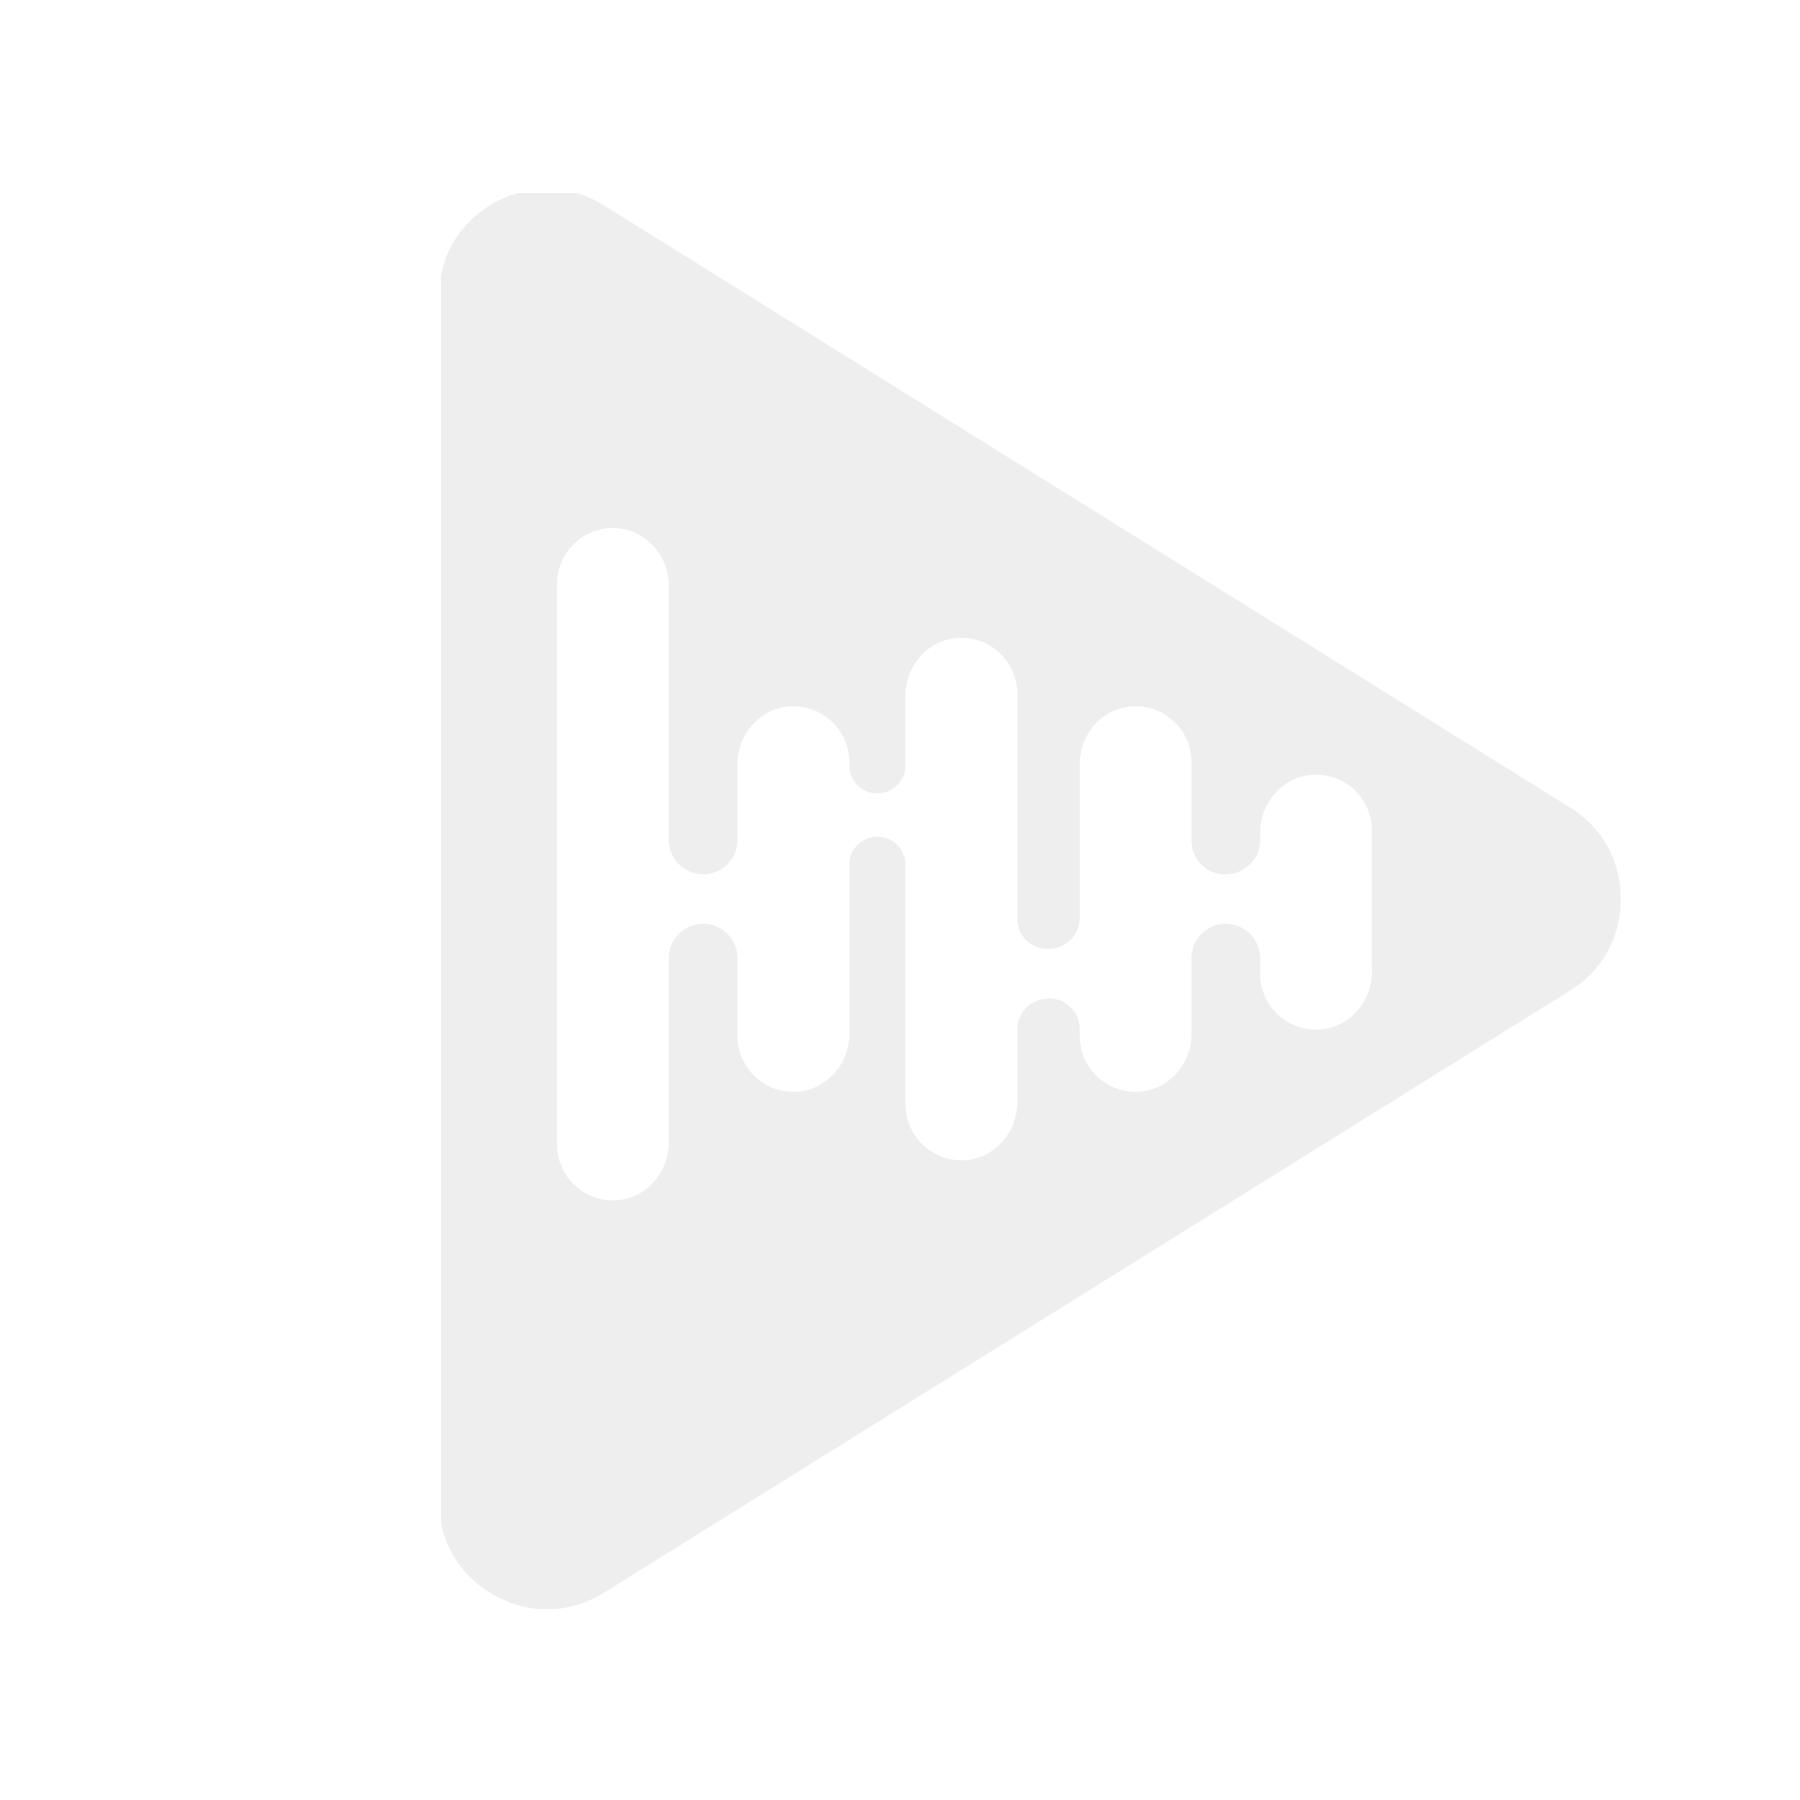 Oehlbach 2601 SILVER EXPRESS PLUS 100 - Audiokabel RCA-RCA /m jord, 24k gull, OFC, 2x skjerm, 1m